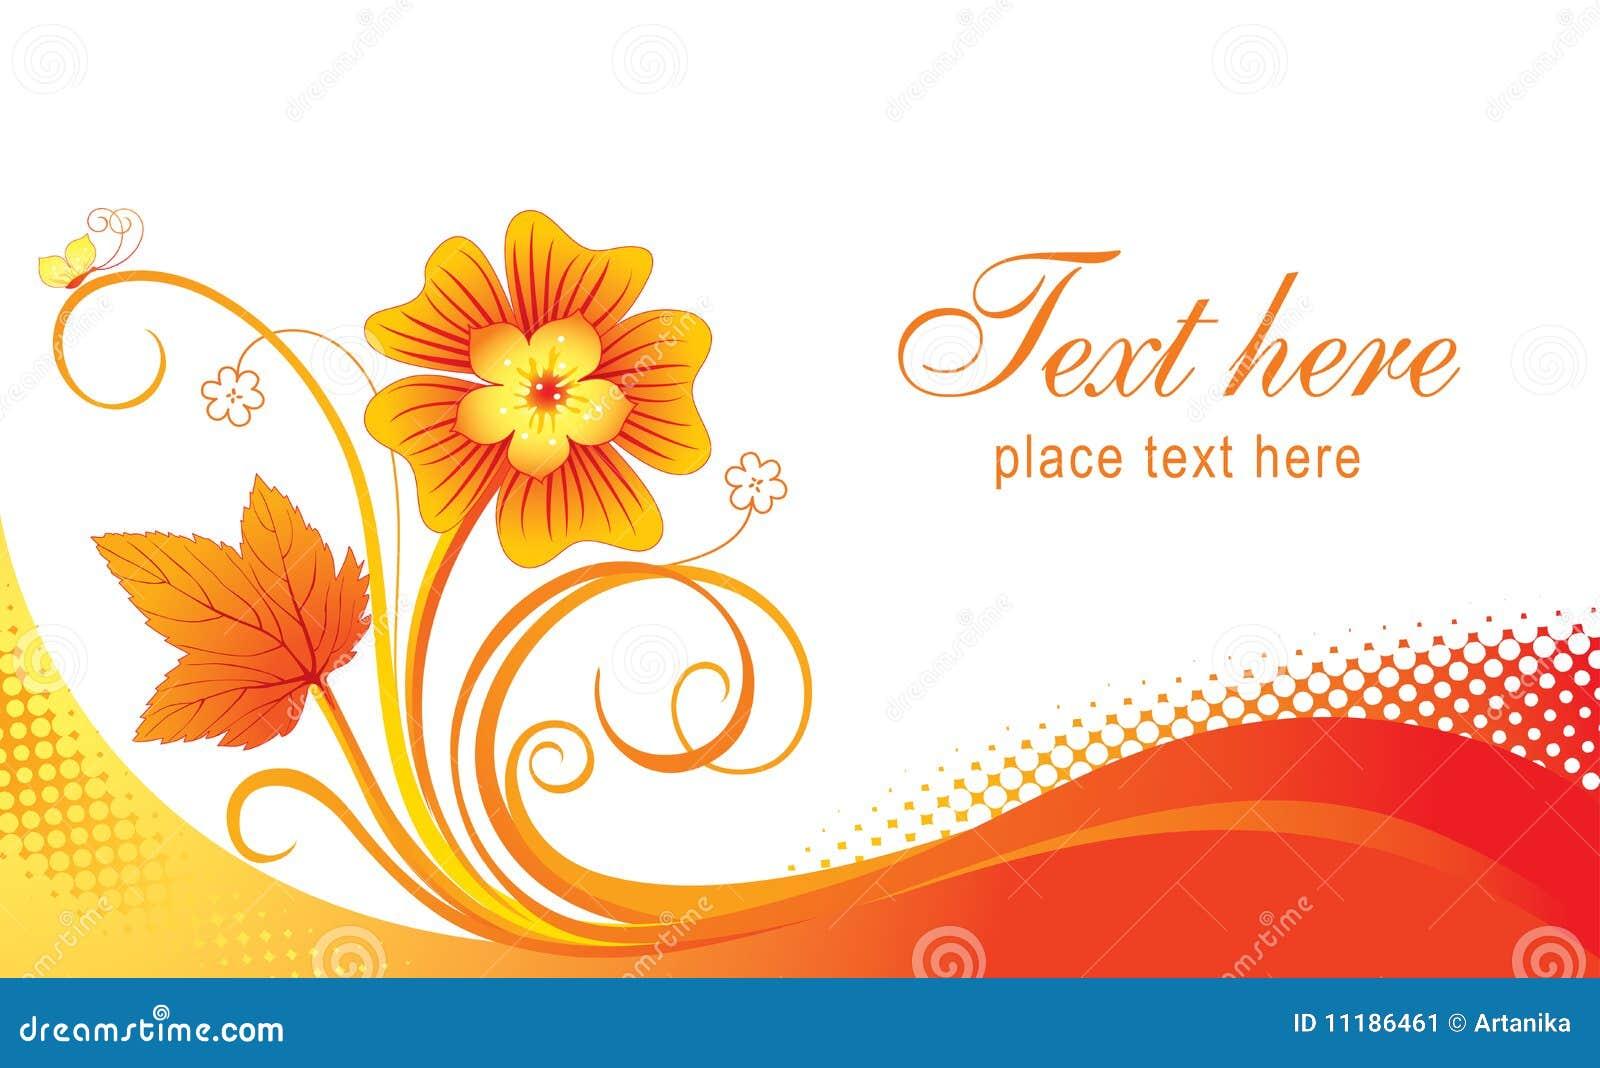 Business card stock vector. Illustration of leaf, pattern - 11186461